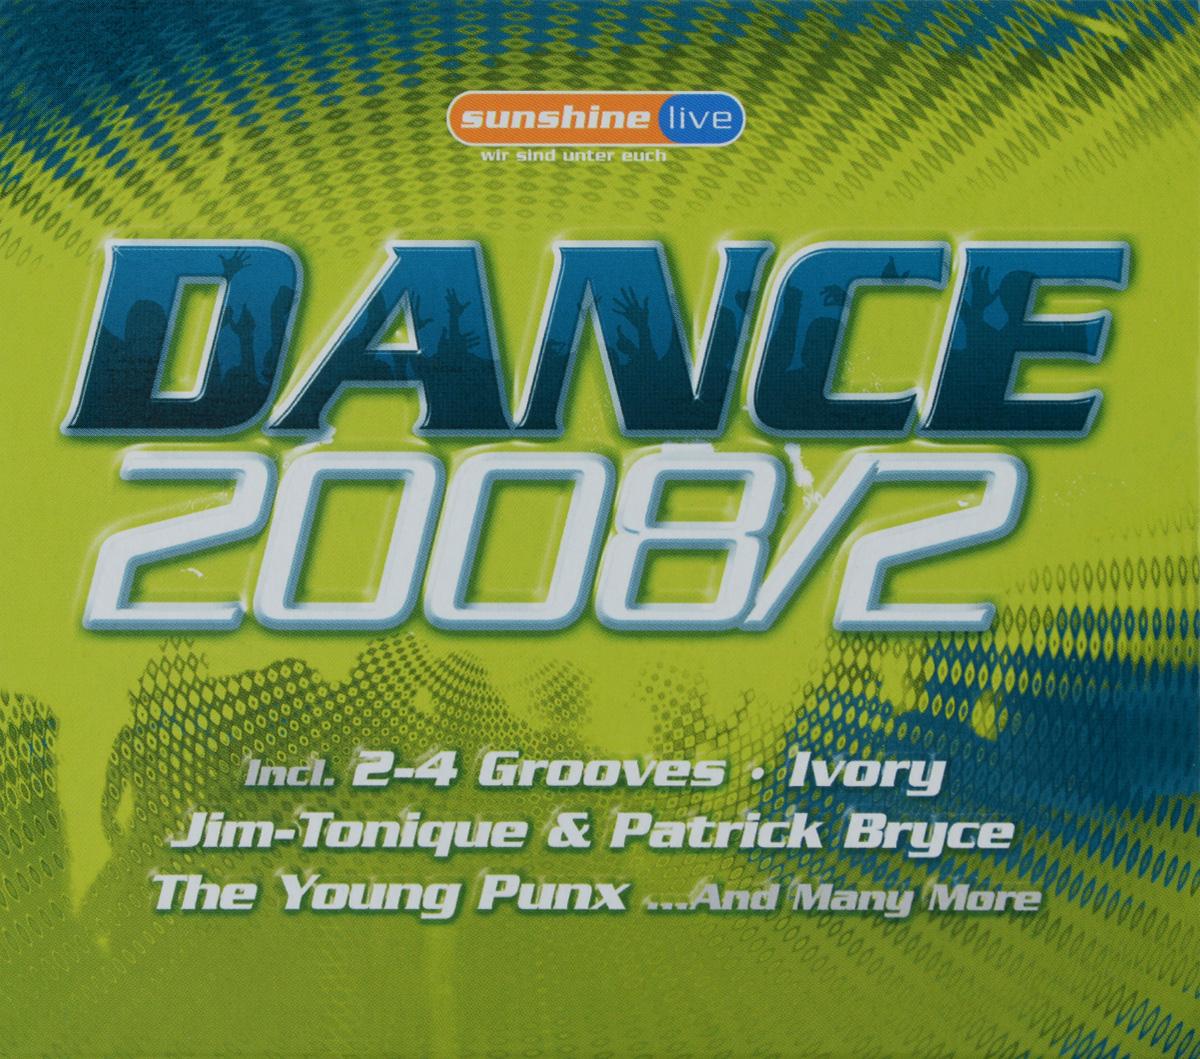 Tom le Mont,Starship Dance 2008/2 Vol. 4 (2 CD) hit dance vol 1 2 cd